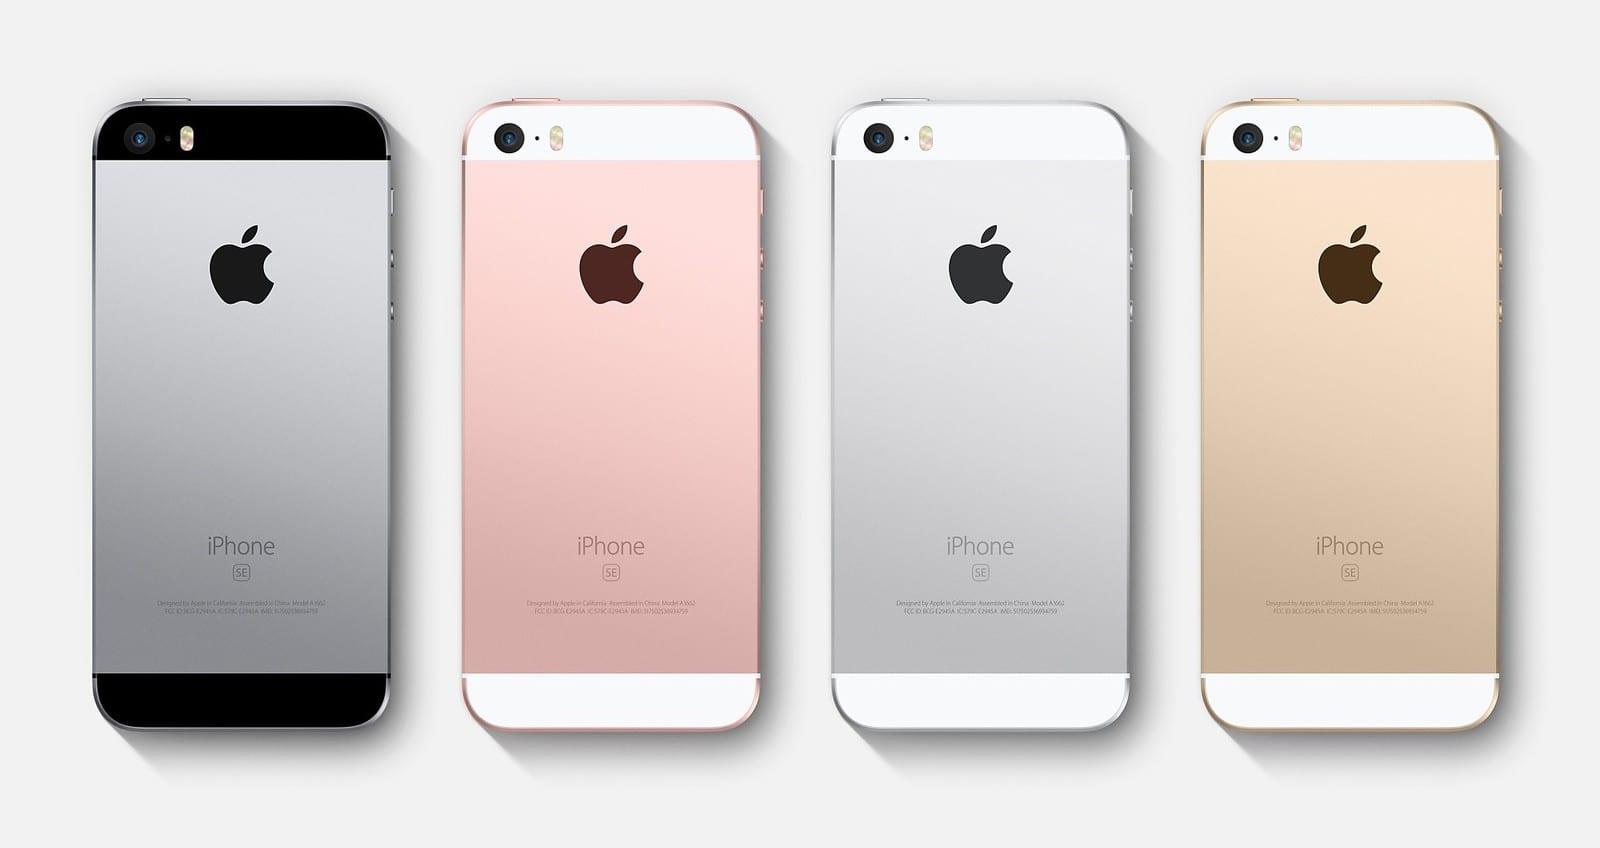 iphone se press nowat - Týždeň v skratke: nové iPhony, Deň Zeme, Apple Pay na Slovensku a ďalšie...